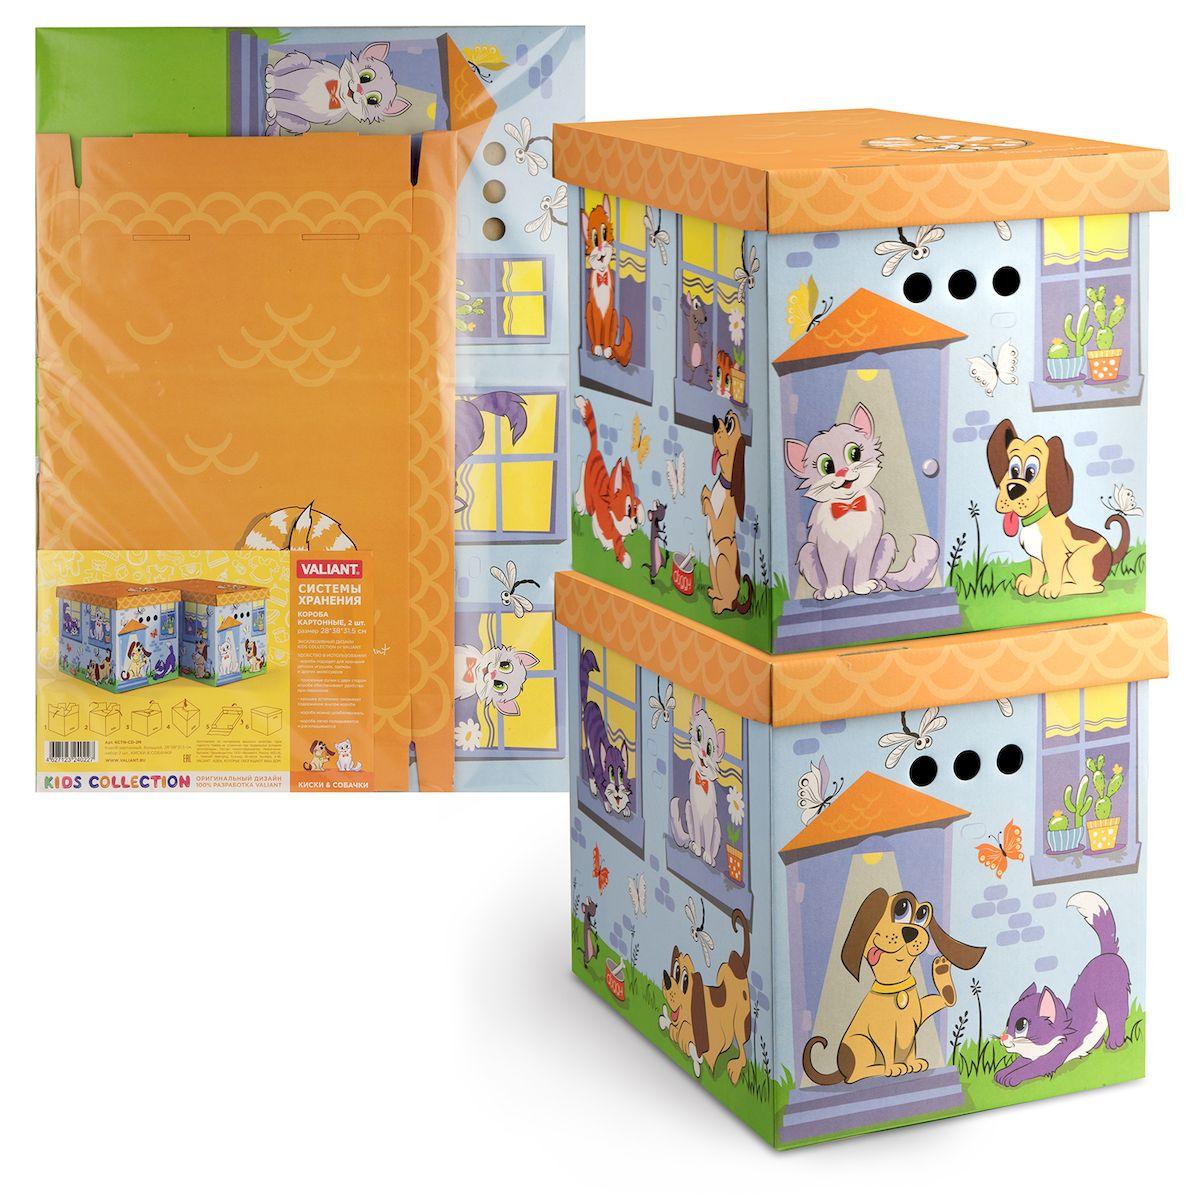 Короб для хранения Valiant Киски&Собачки, складной, 28  38  31,5 см,  шт